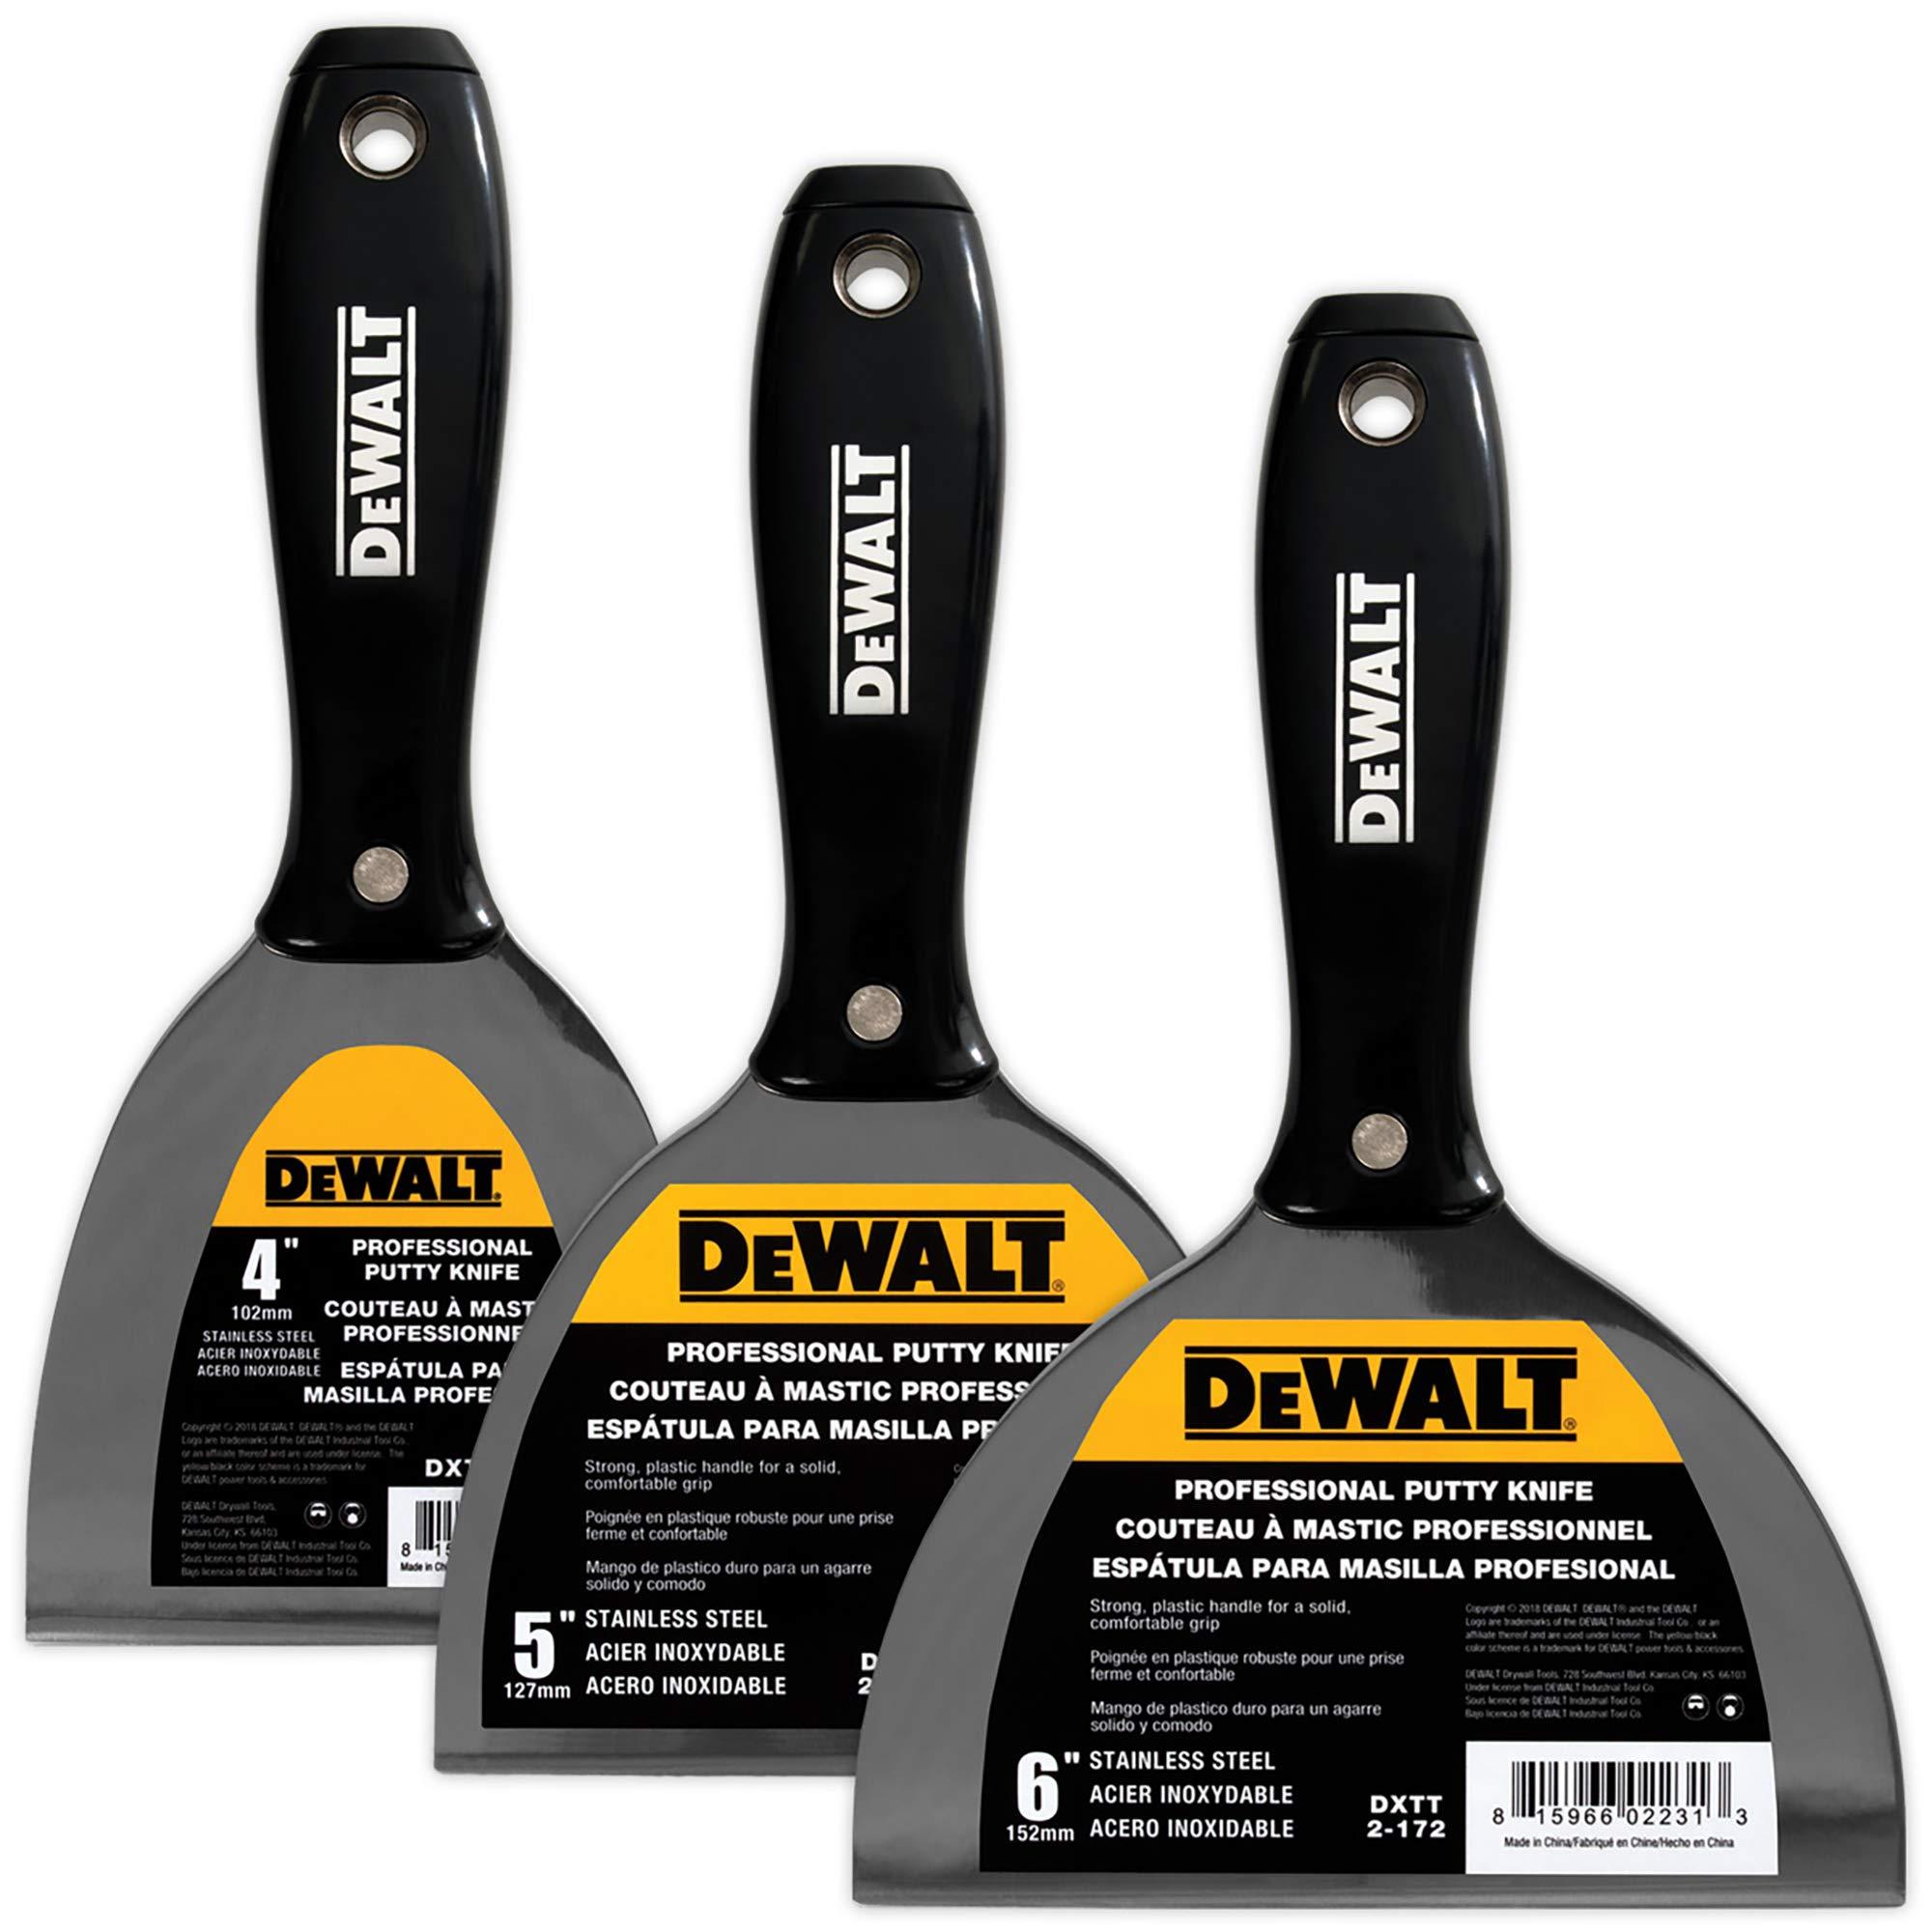 DEWALT Stainless Steel Putty Knife 3-Pack | 4/5/6-Inches | DXTT-3-170